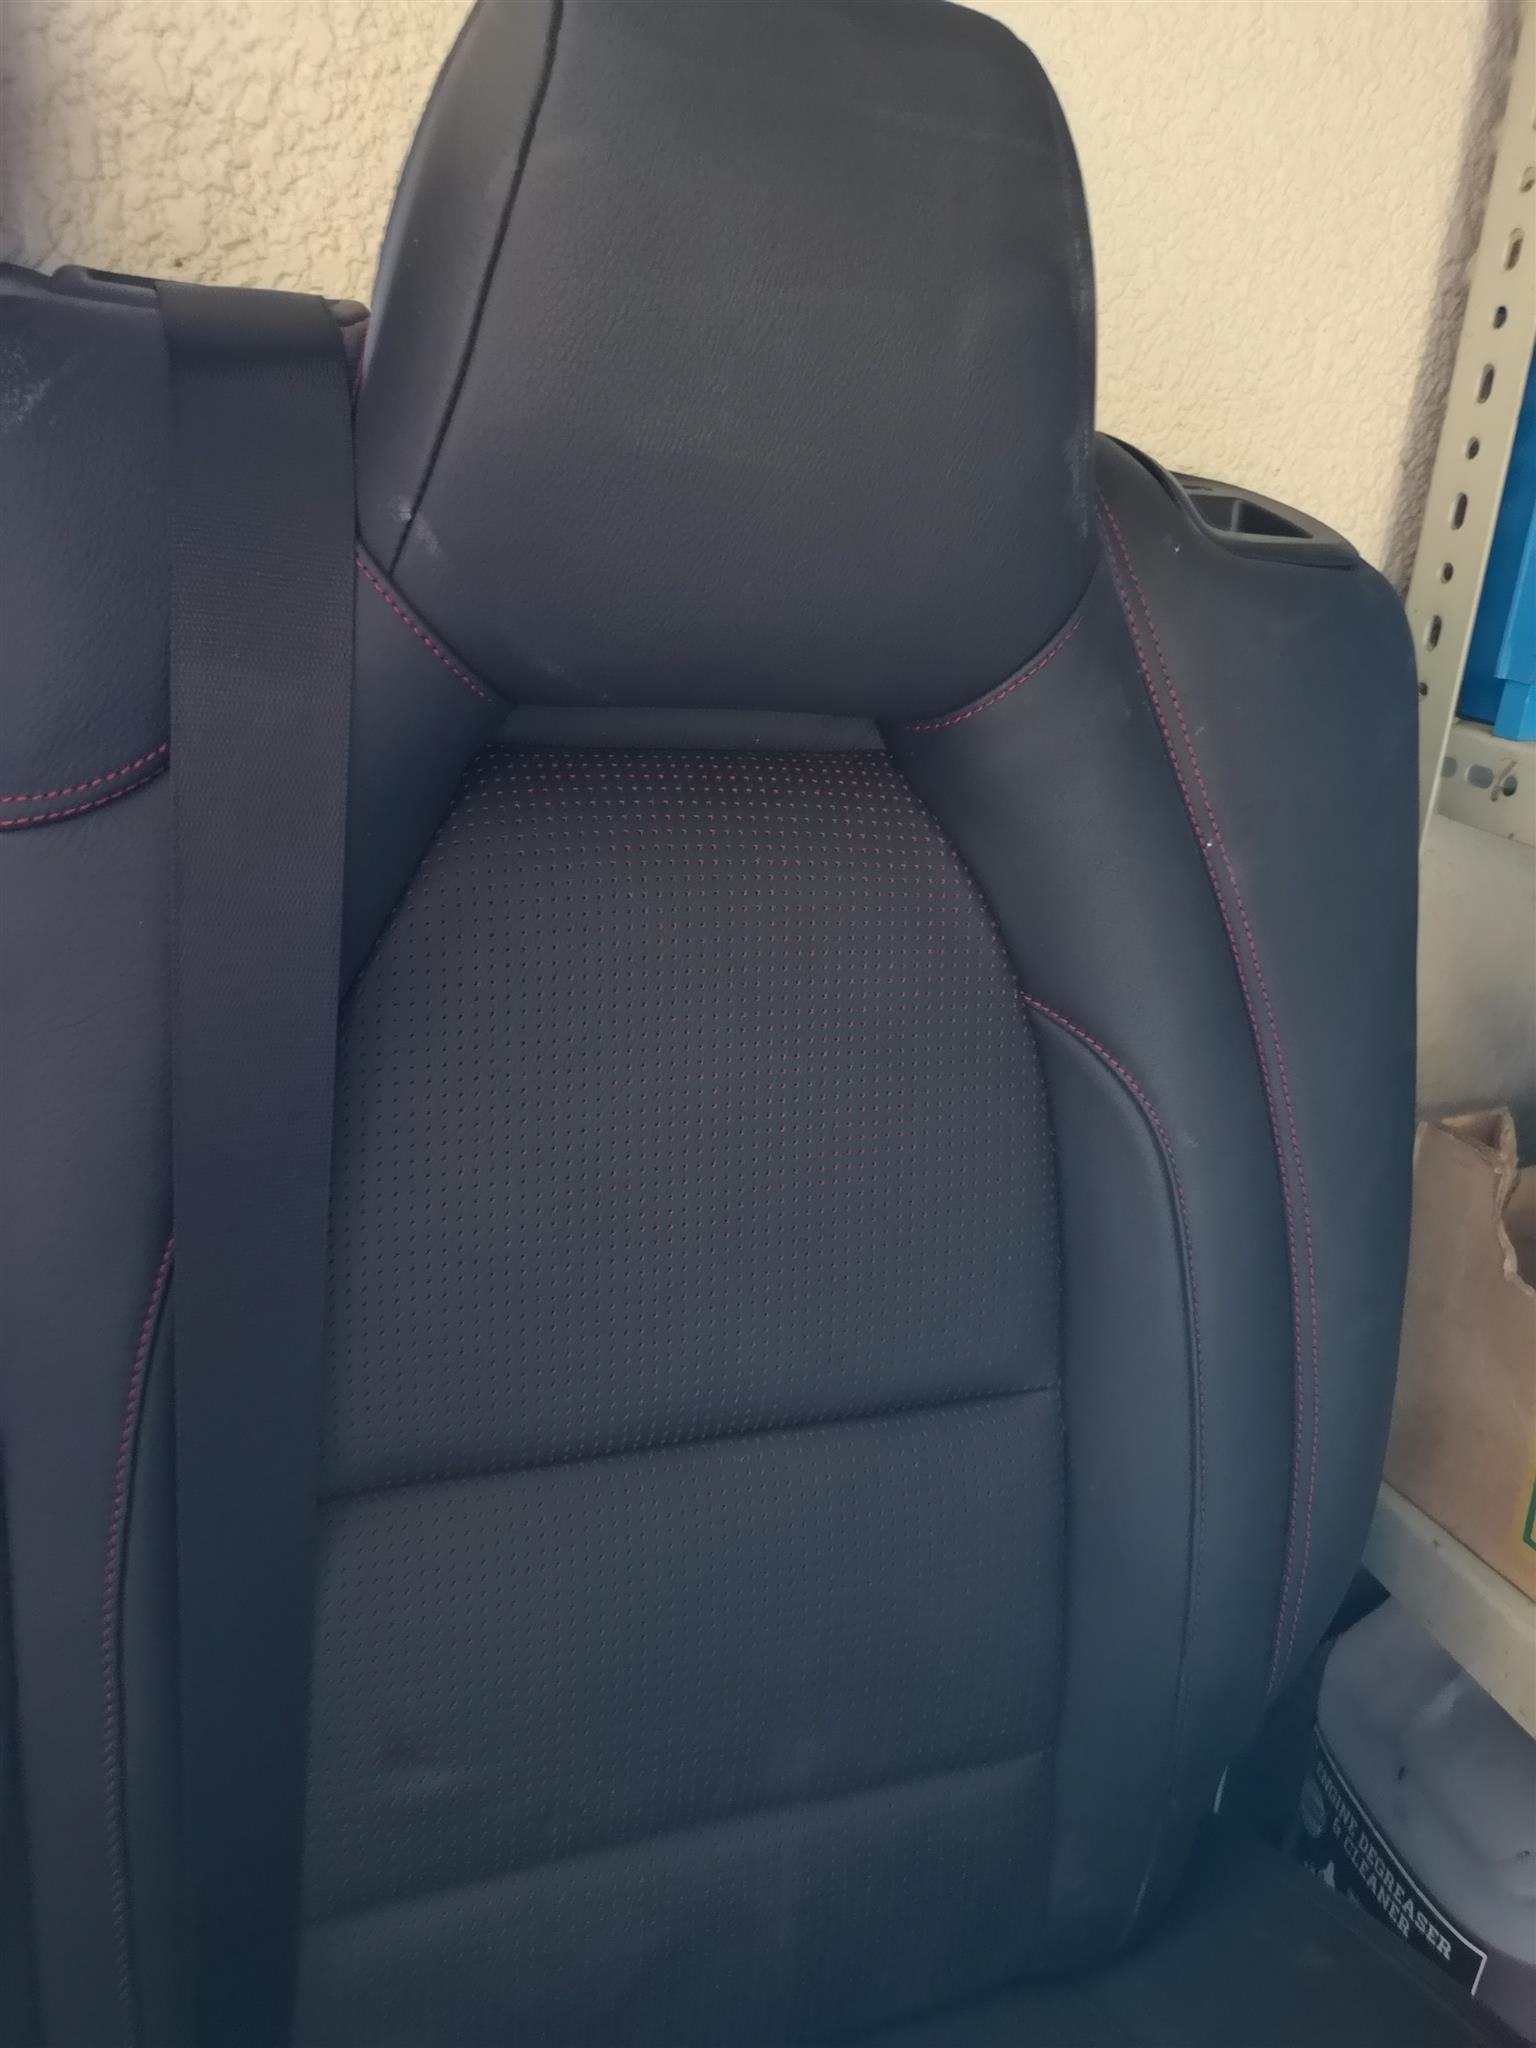 Mercedes a class w176 rear seat